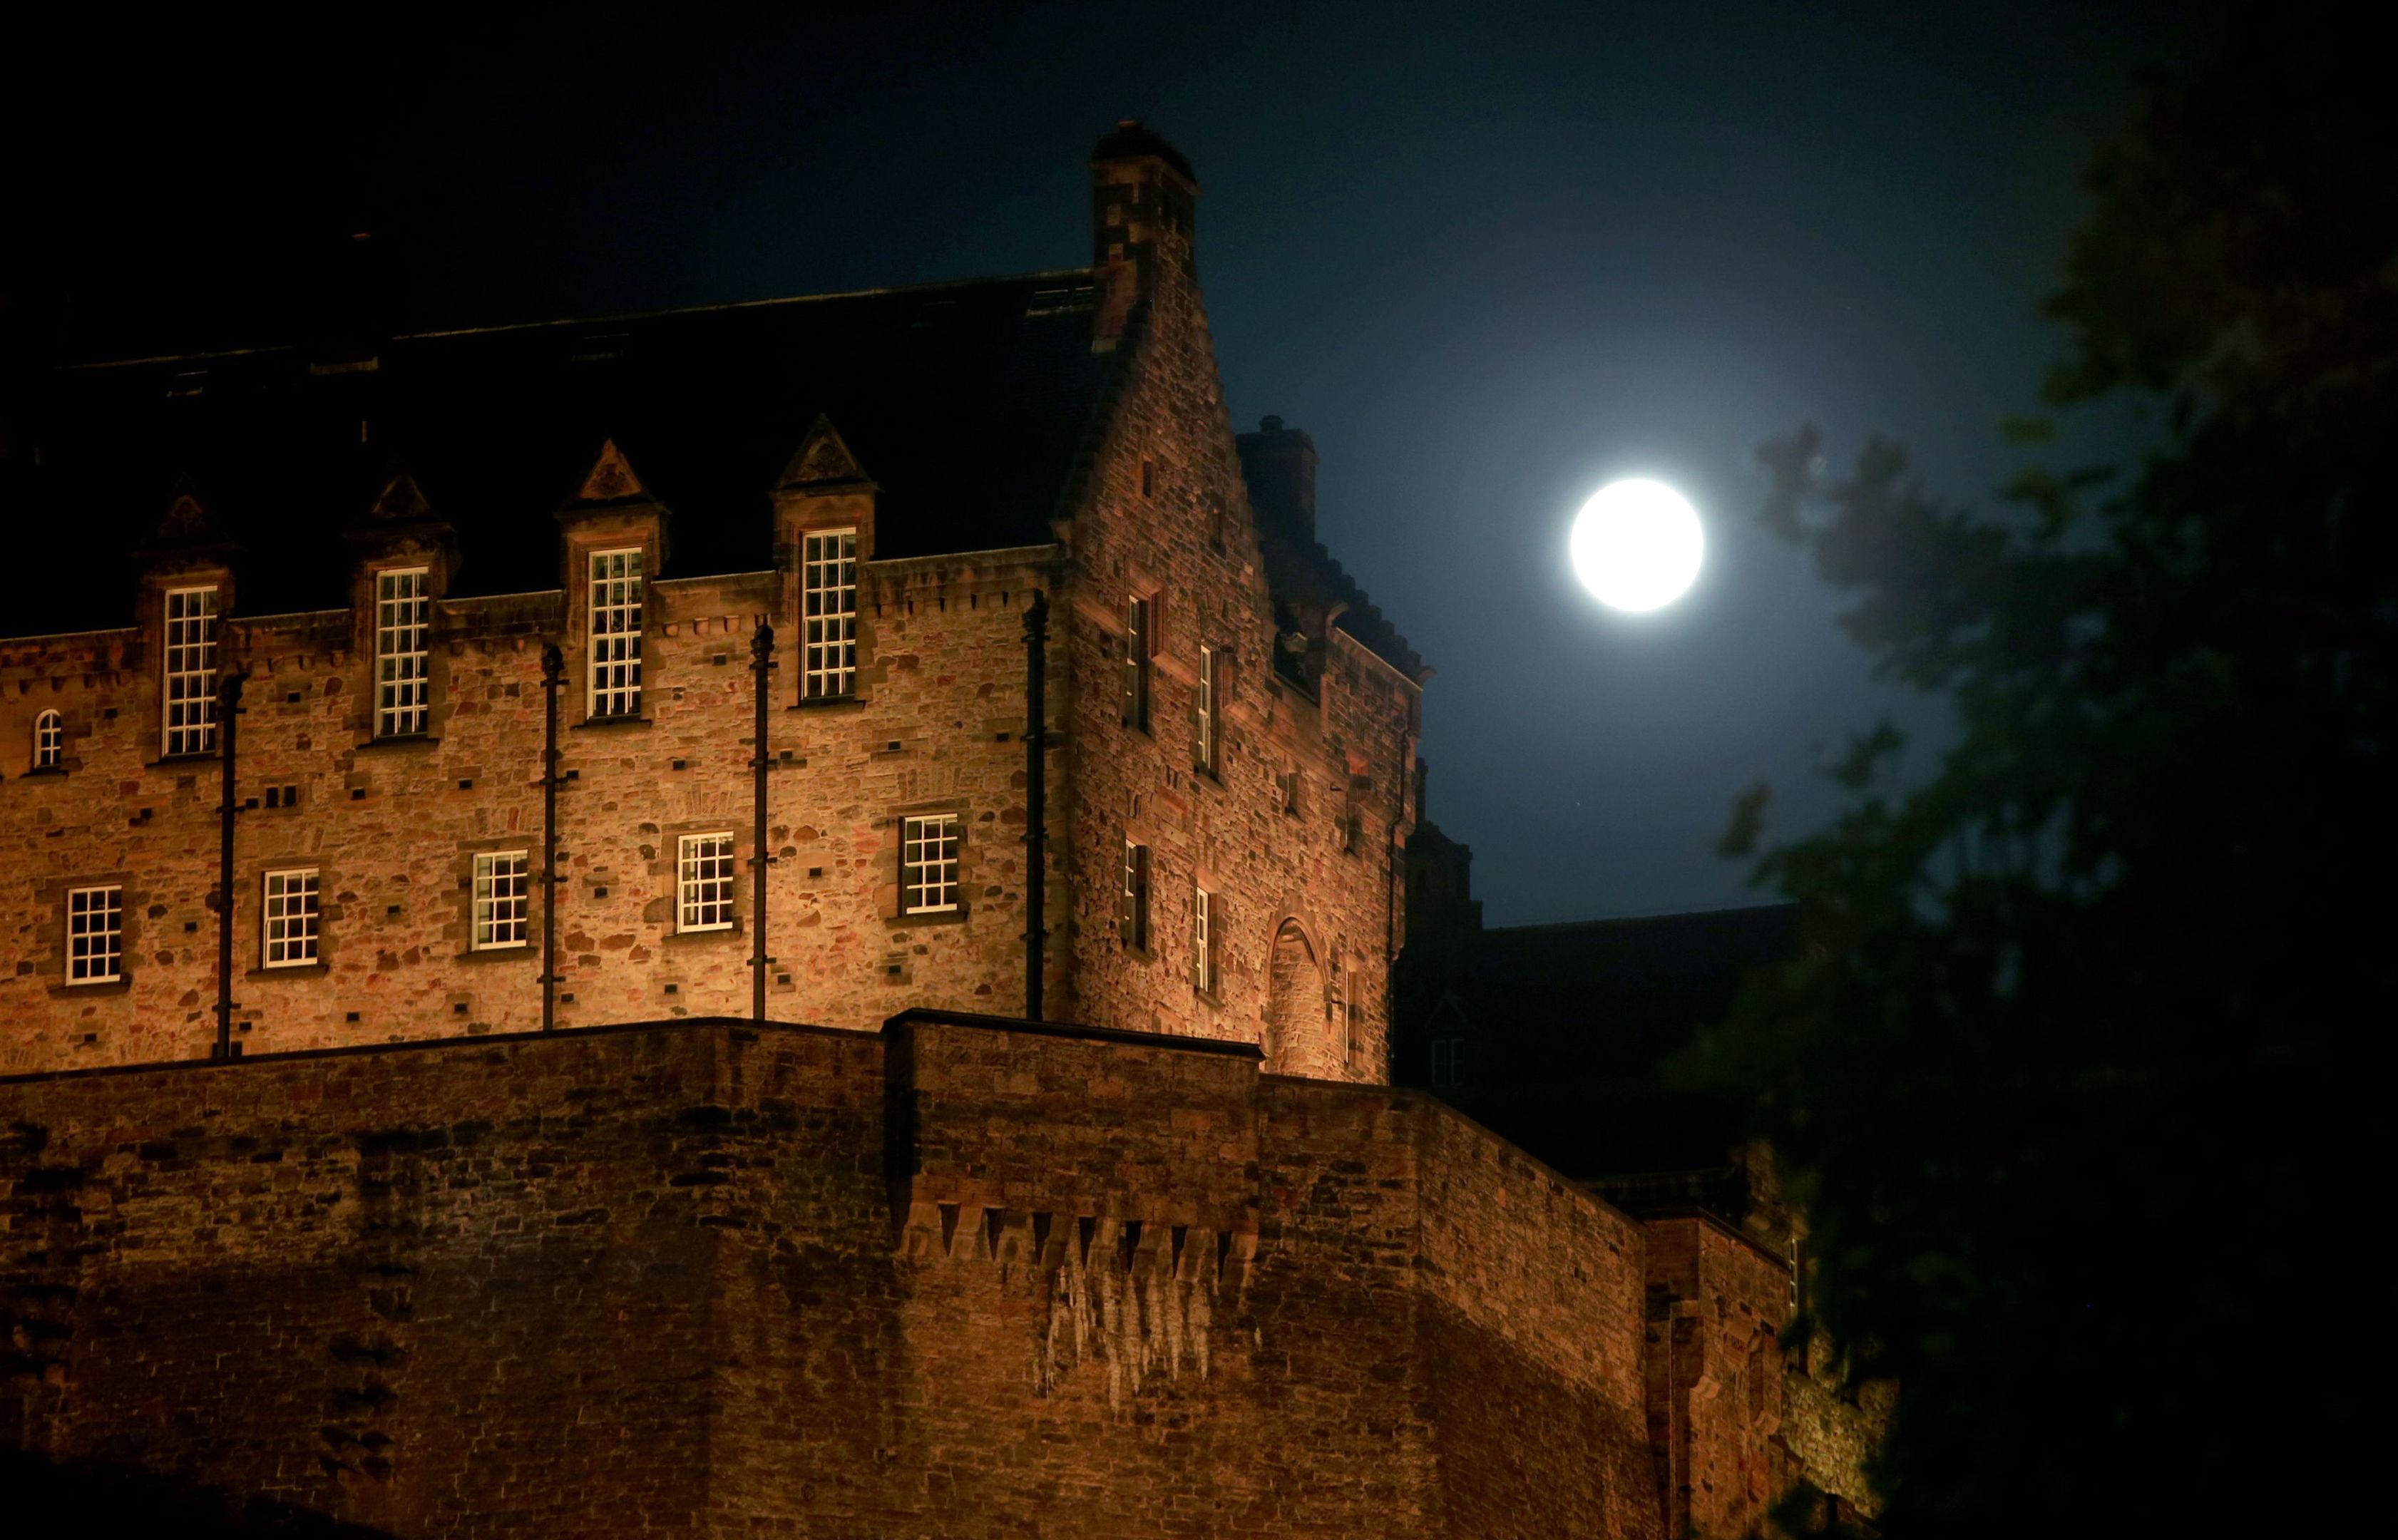 The August full moon in Edinburgh last night.